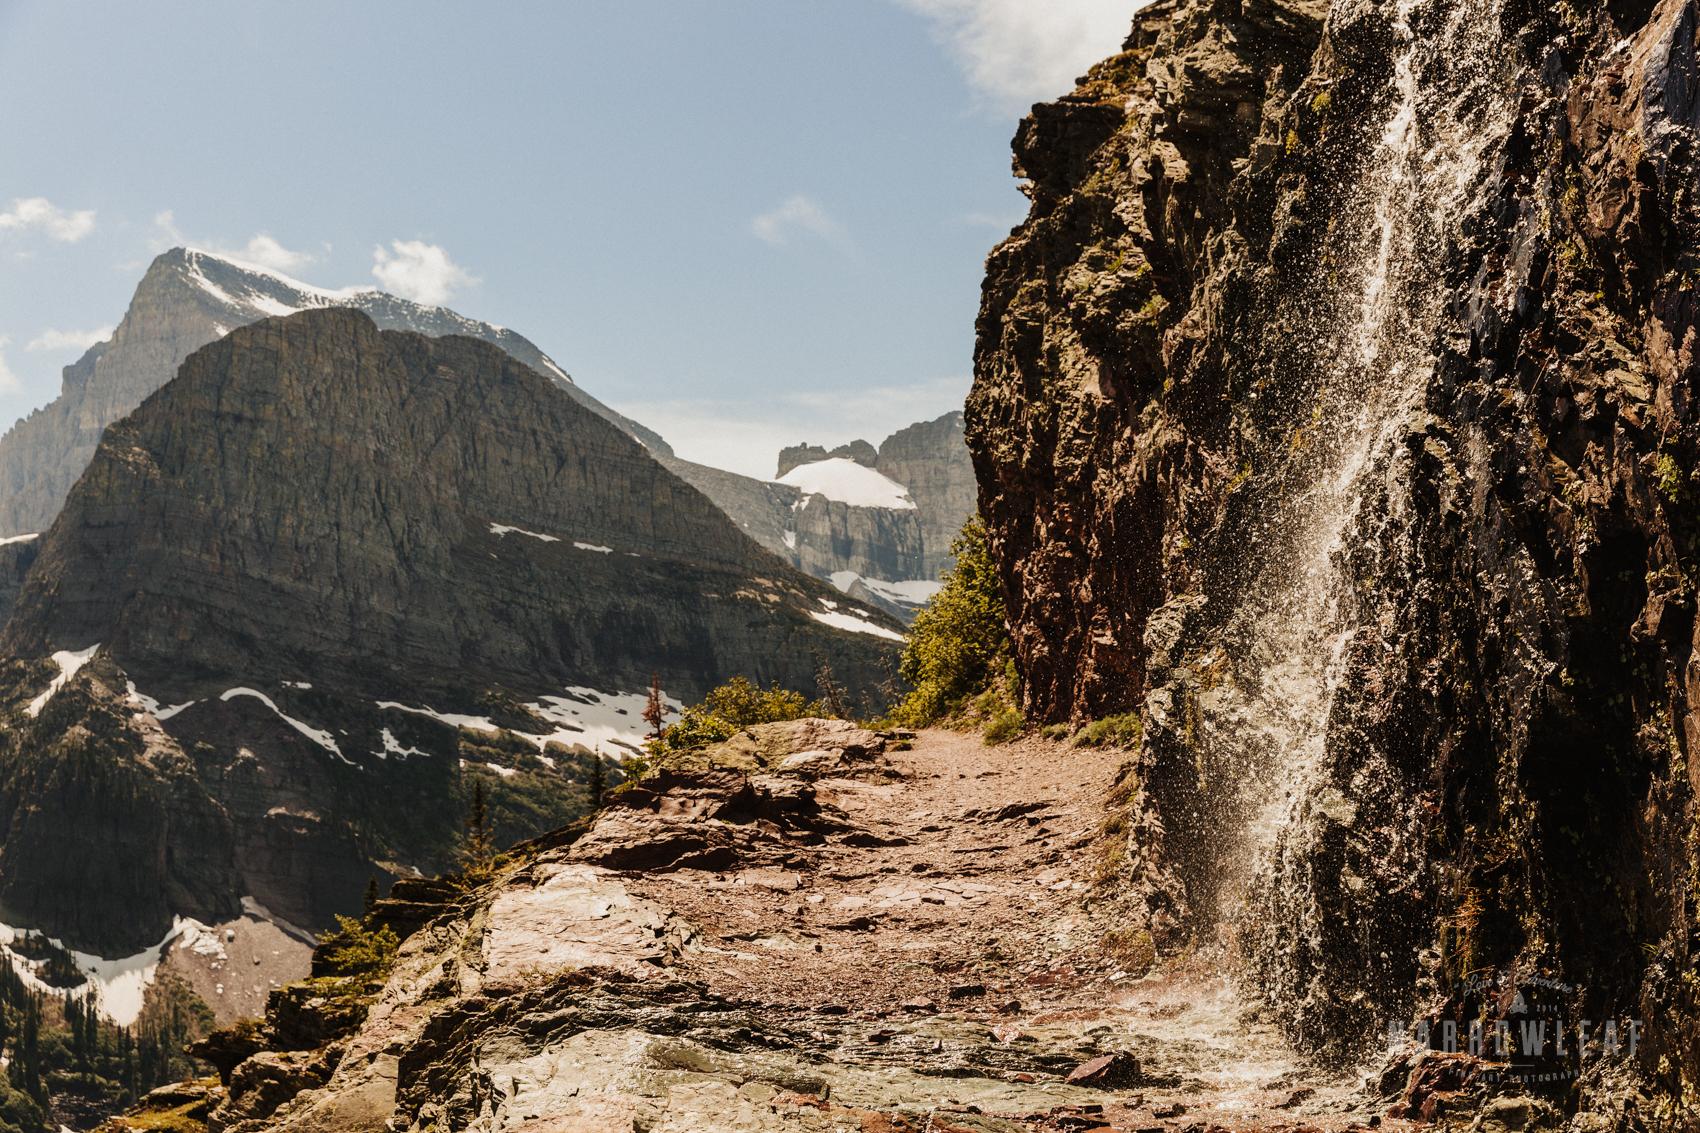 Montana-Glacier-National-Park-grinnell-glacier-Narrowleaf-Love-and-Adventure-elopement-Photography.jpg